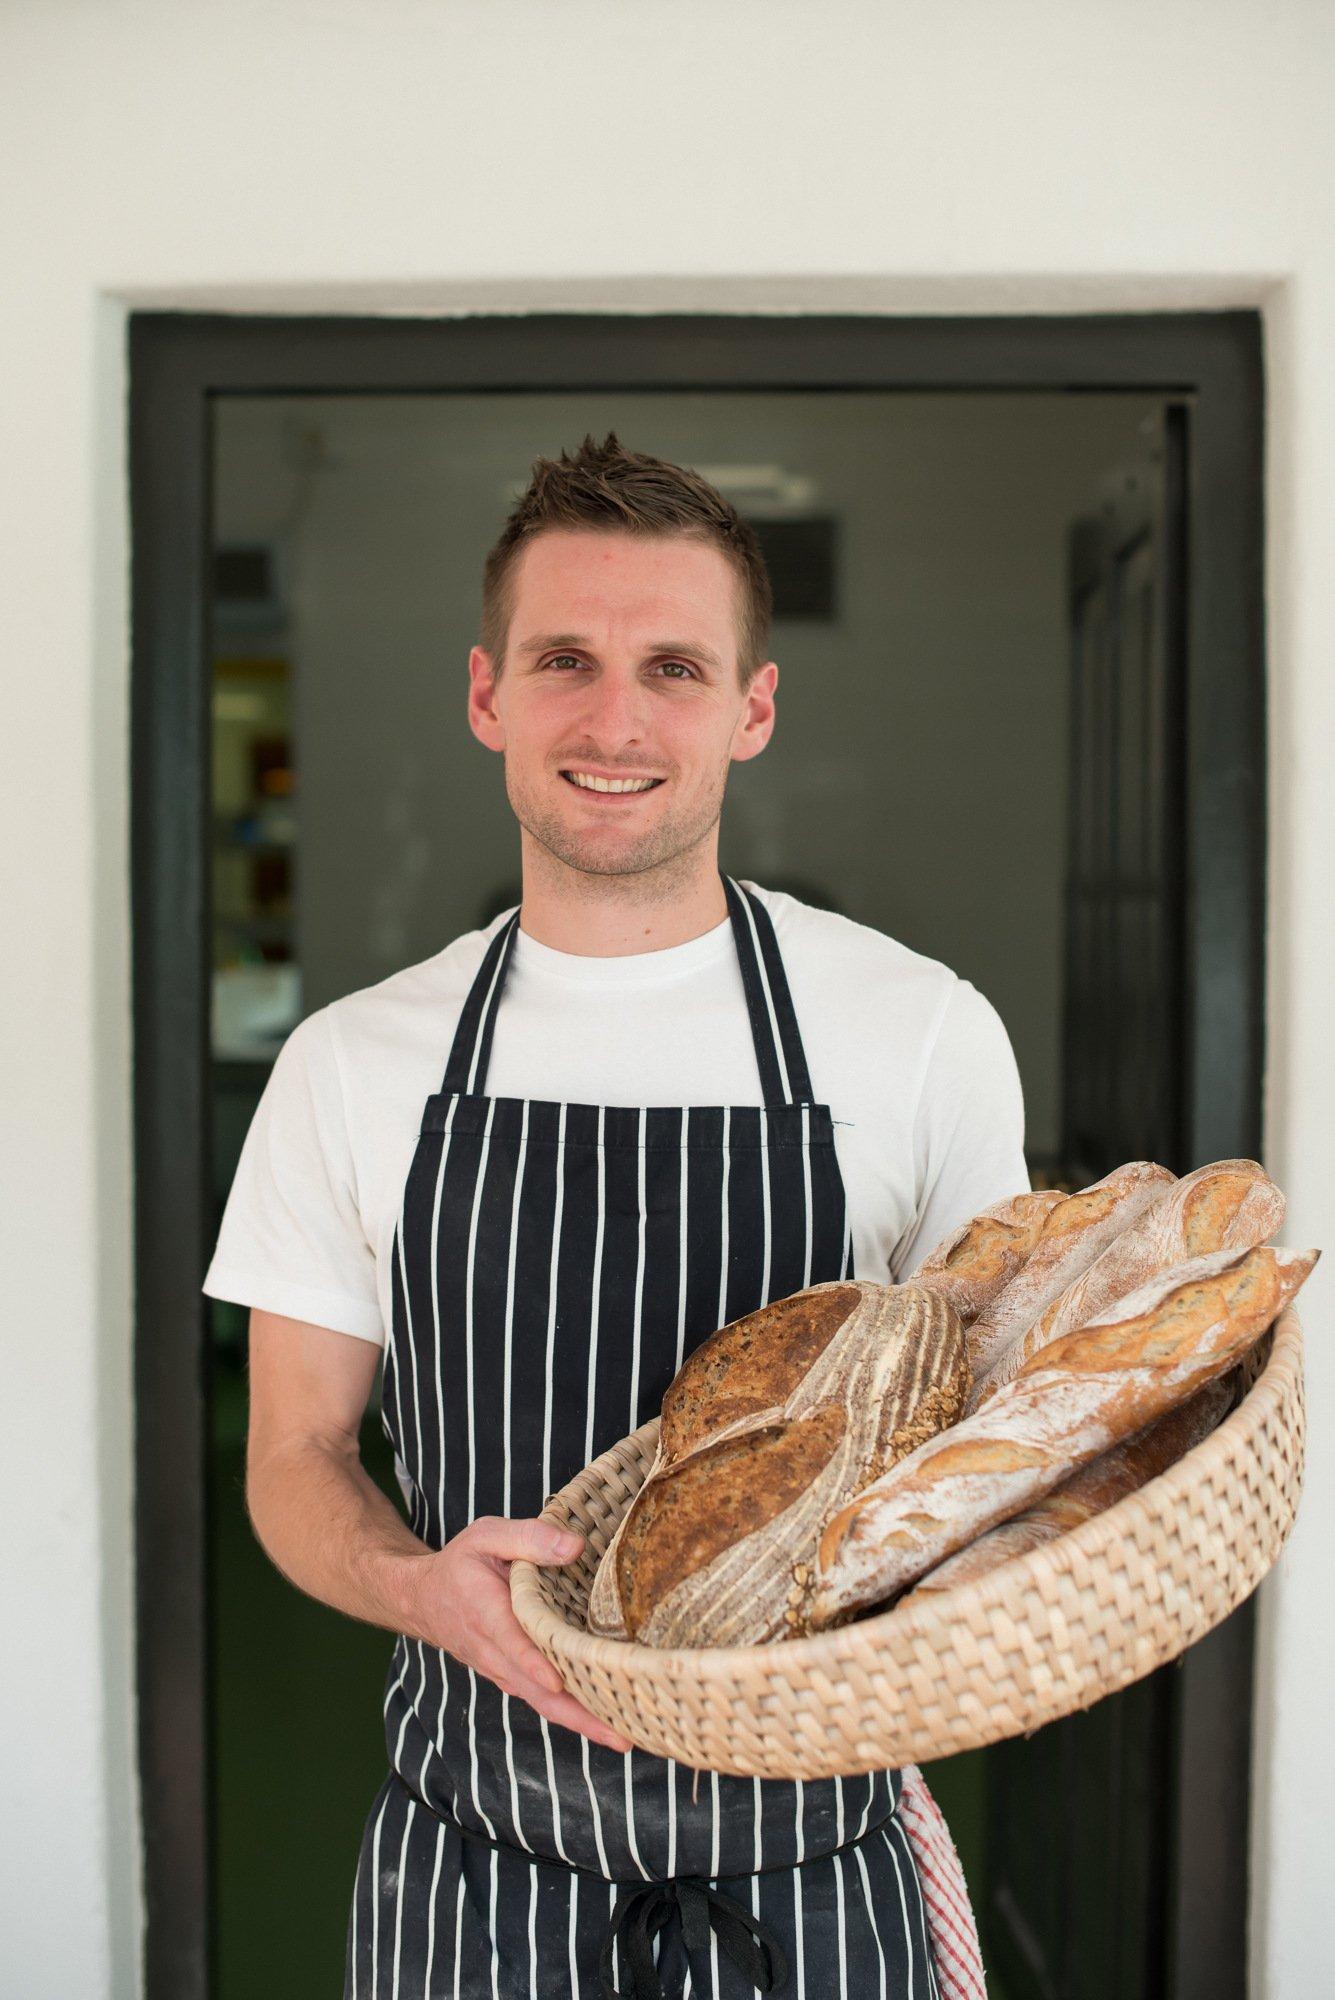 breads basket vadas smokehouse sonia cabano blog eatdrinkcapetown